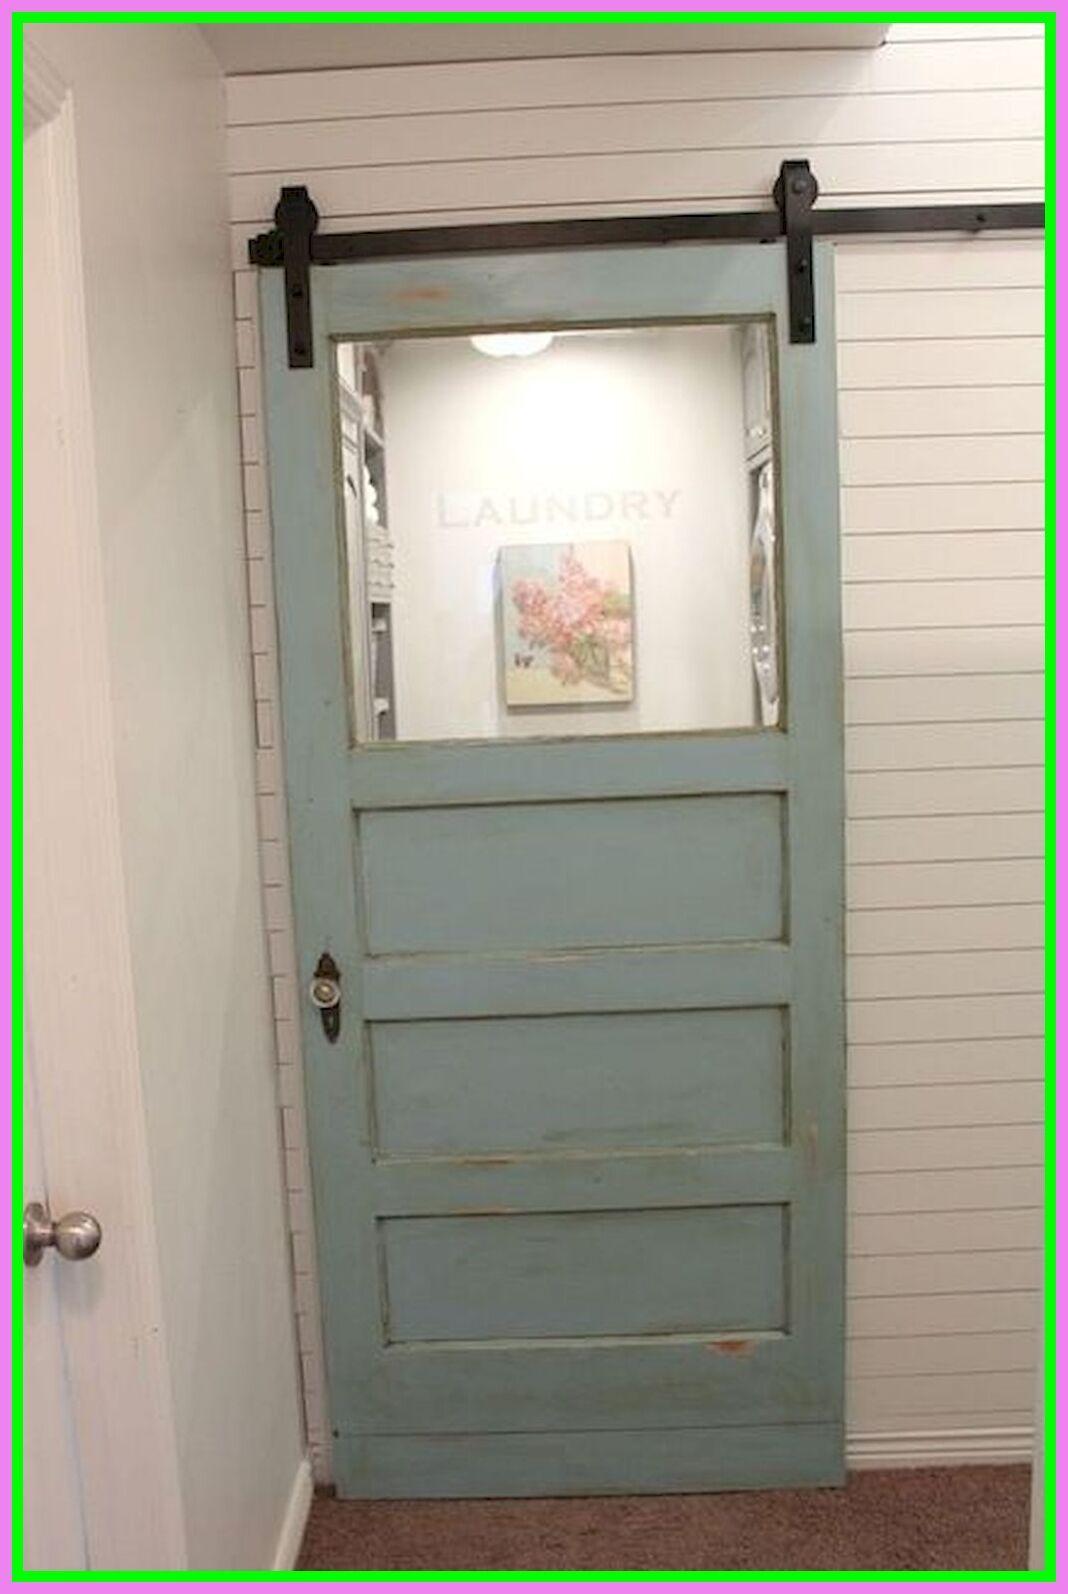 108 Reference Of Barn Door Laundry Room Residential In 2020 Interior Barn Doors Diy Barn Door Barn Doors Sliding